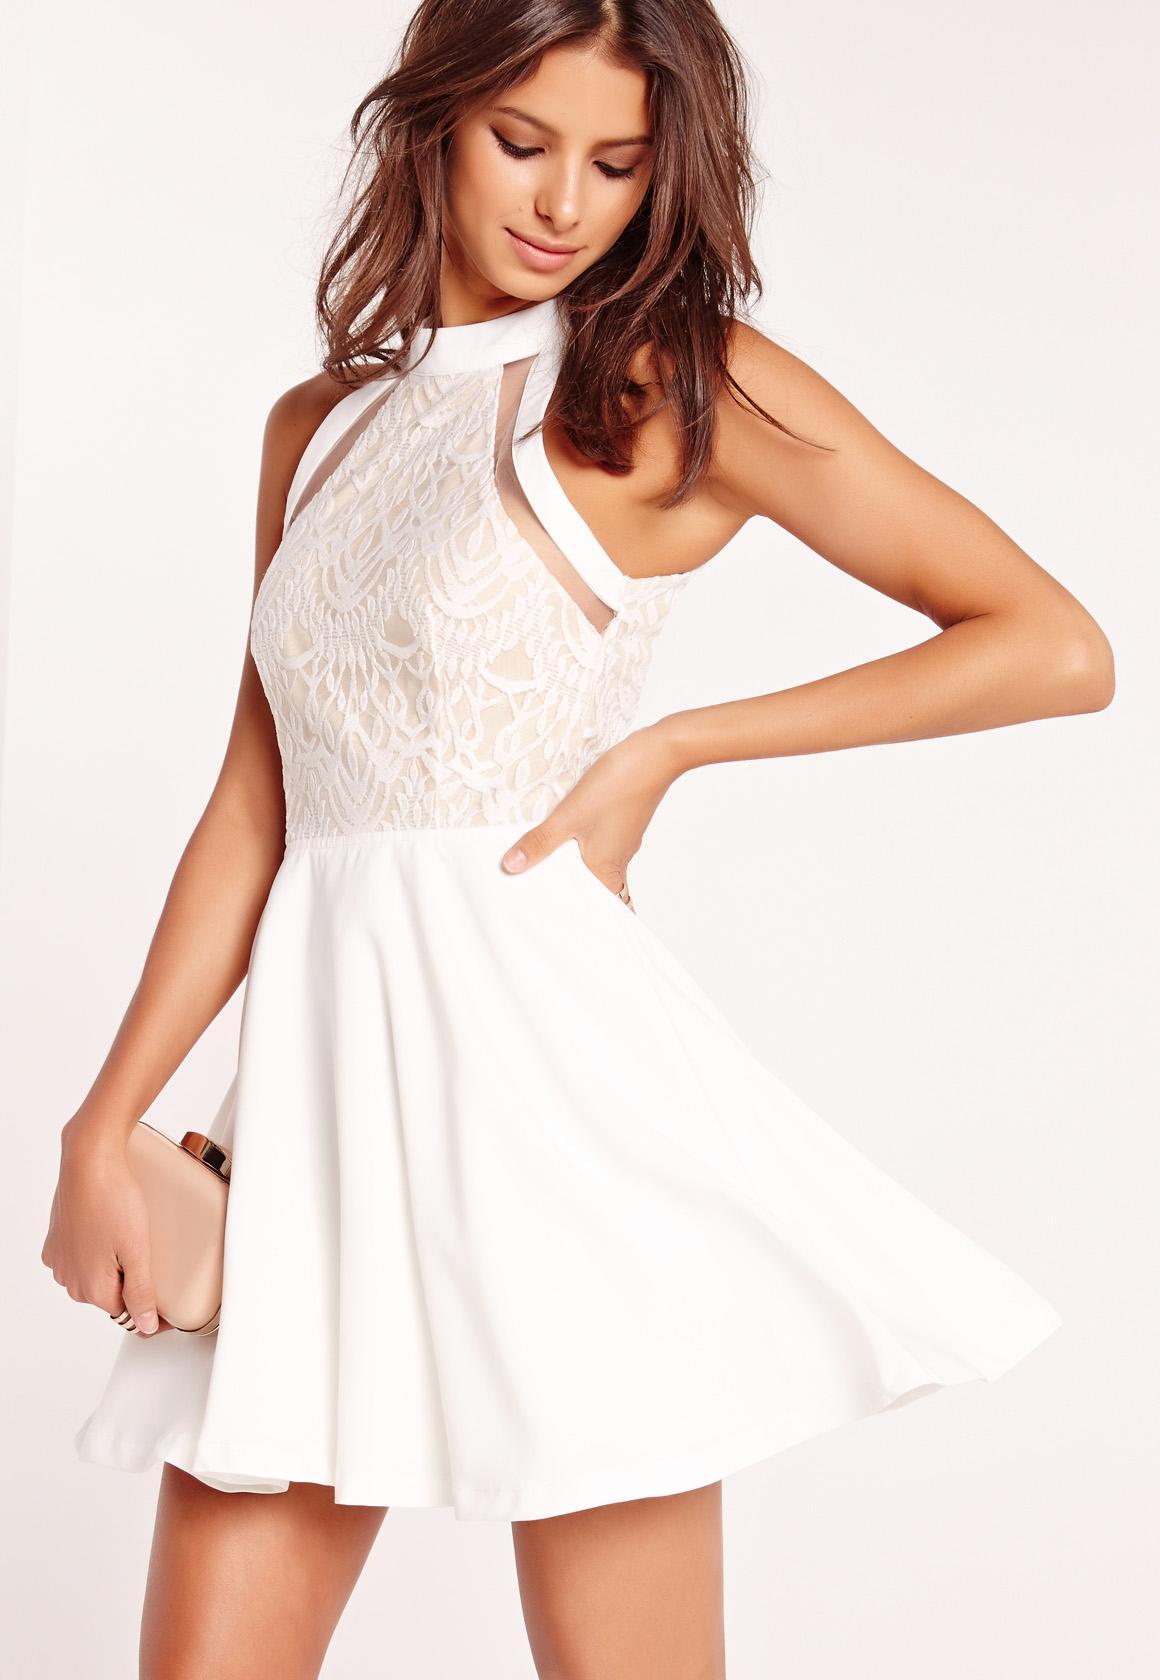 robe blanche dentelle courte droite robe de blanche. Black Bedroom Furniture Sets. Home Design Ideas